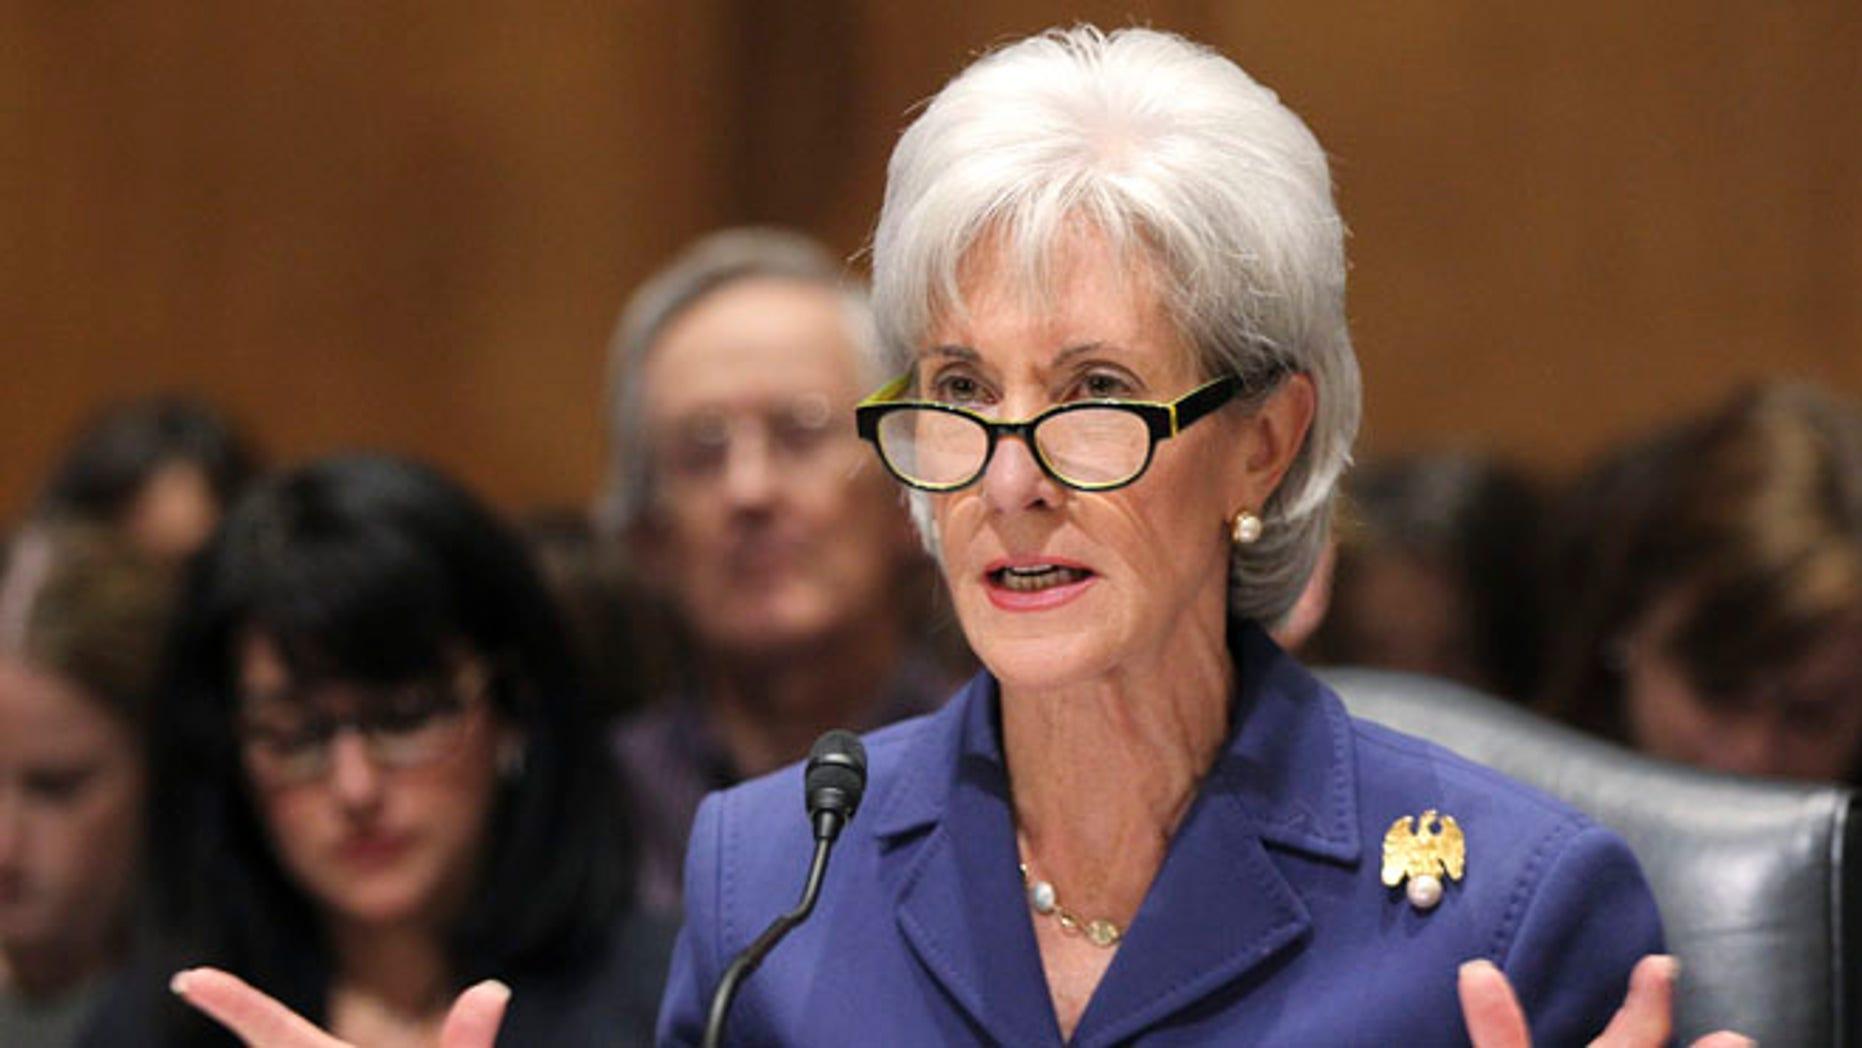 FILE: Nov. 6, 2013: Health and Human Services Secretary Kathleen Sebelius testifies on Capitol Hill.